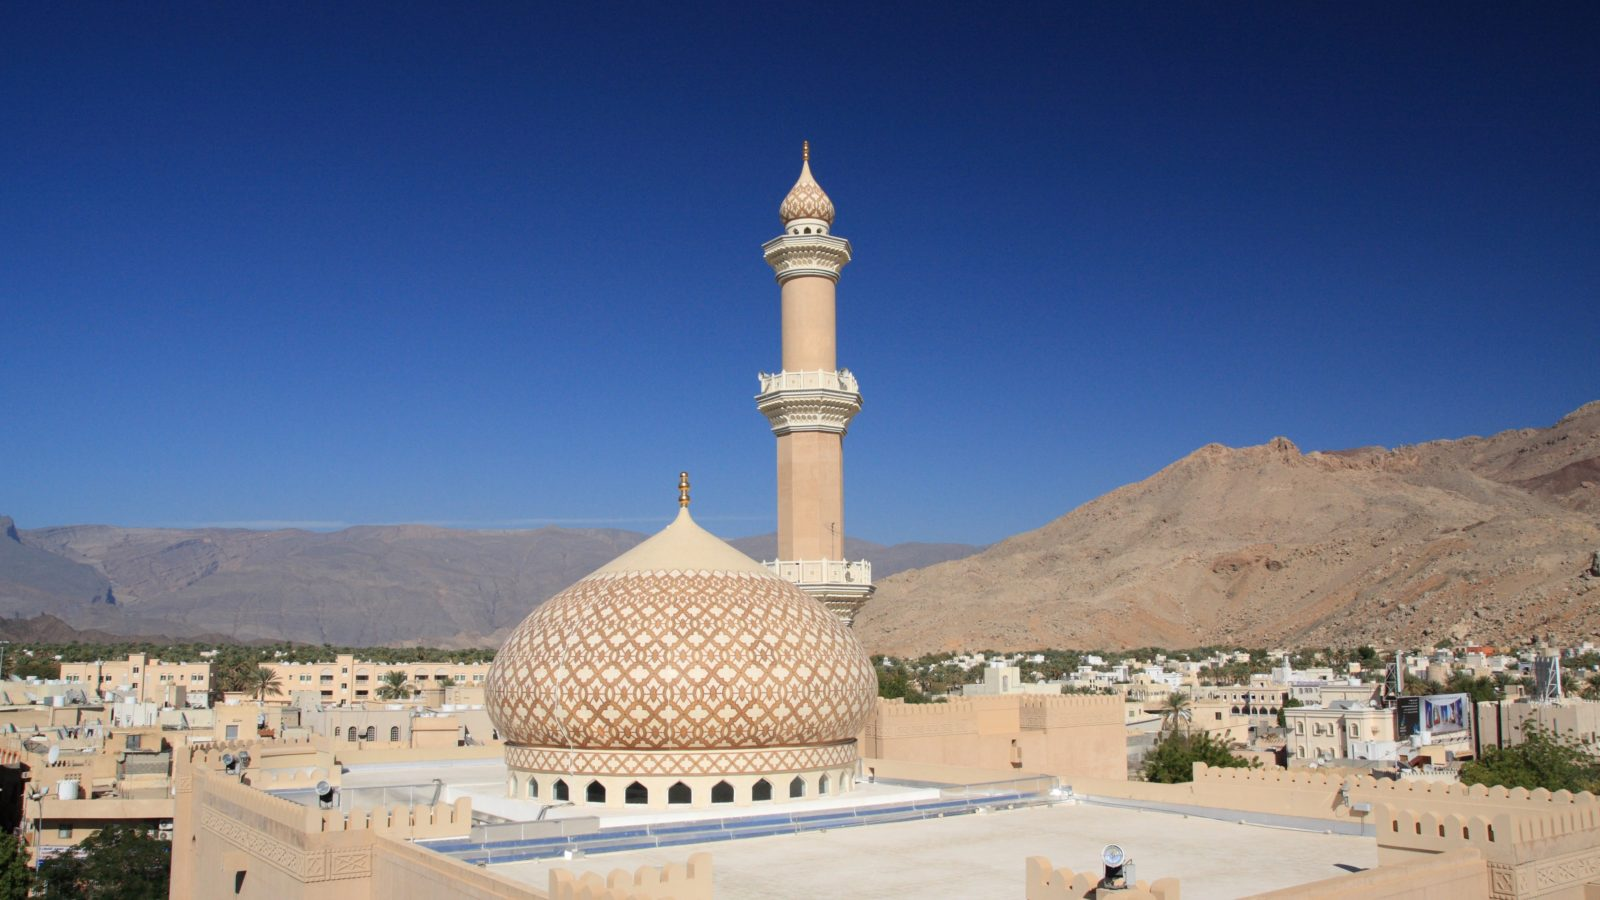 As_Sultan_Qaboos_Mosque,_Nizwa,_Oman_(4324808056)